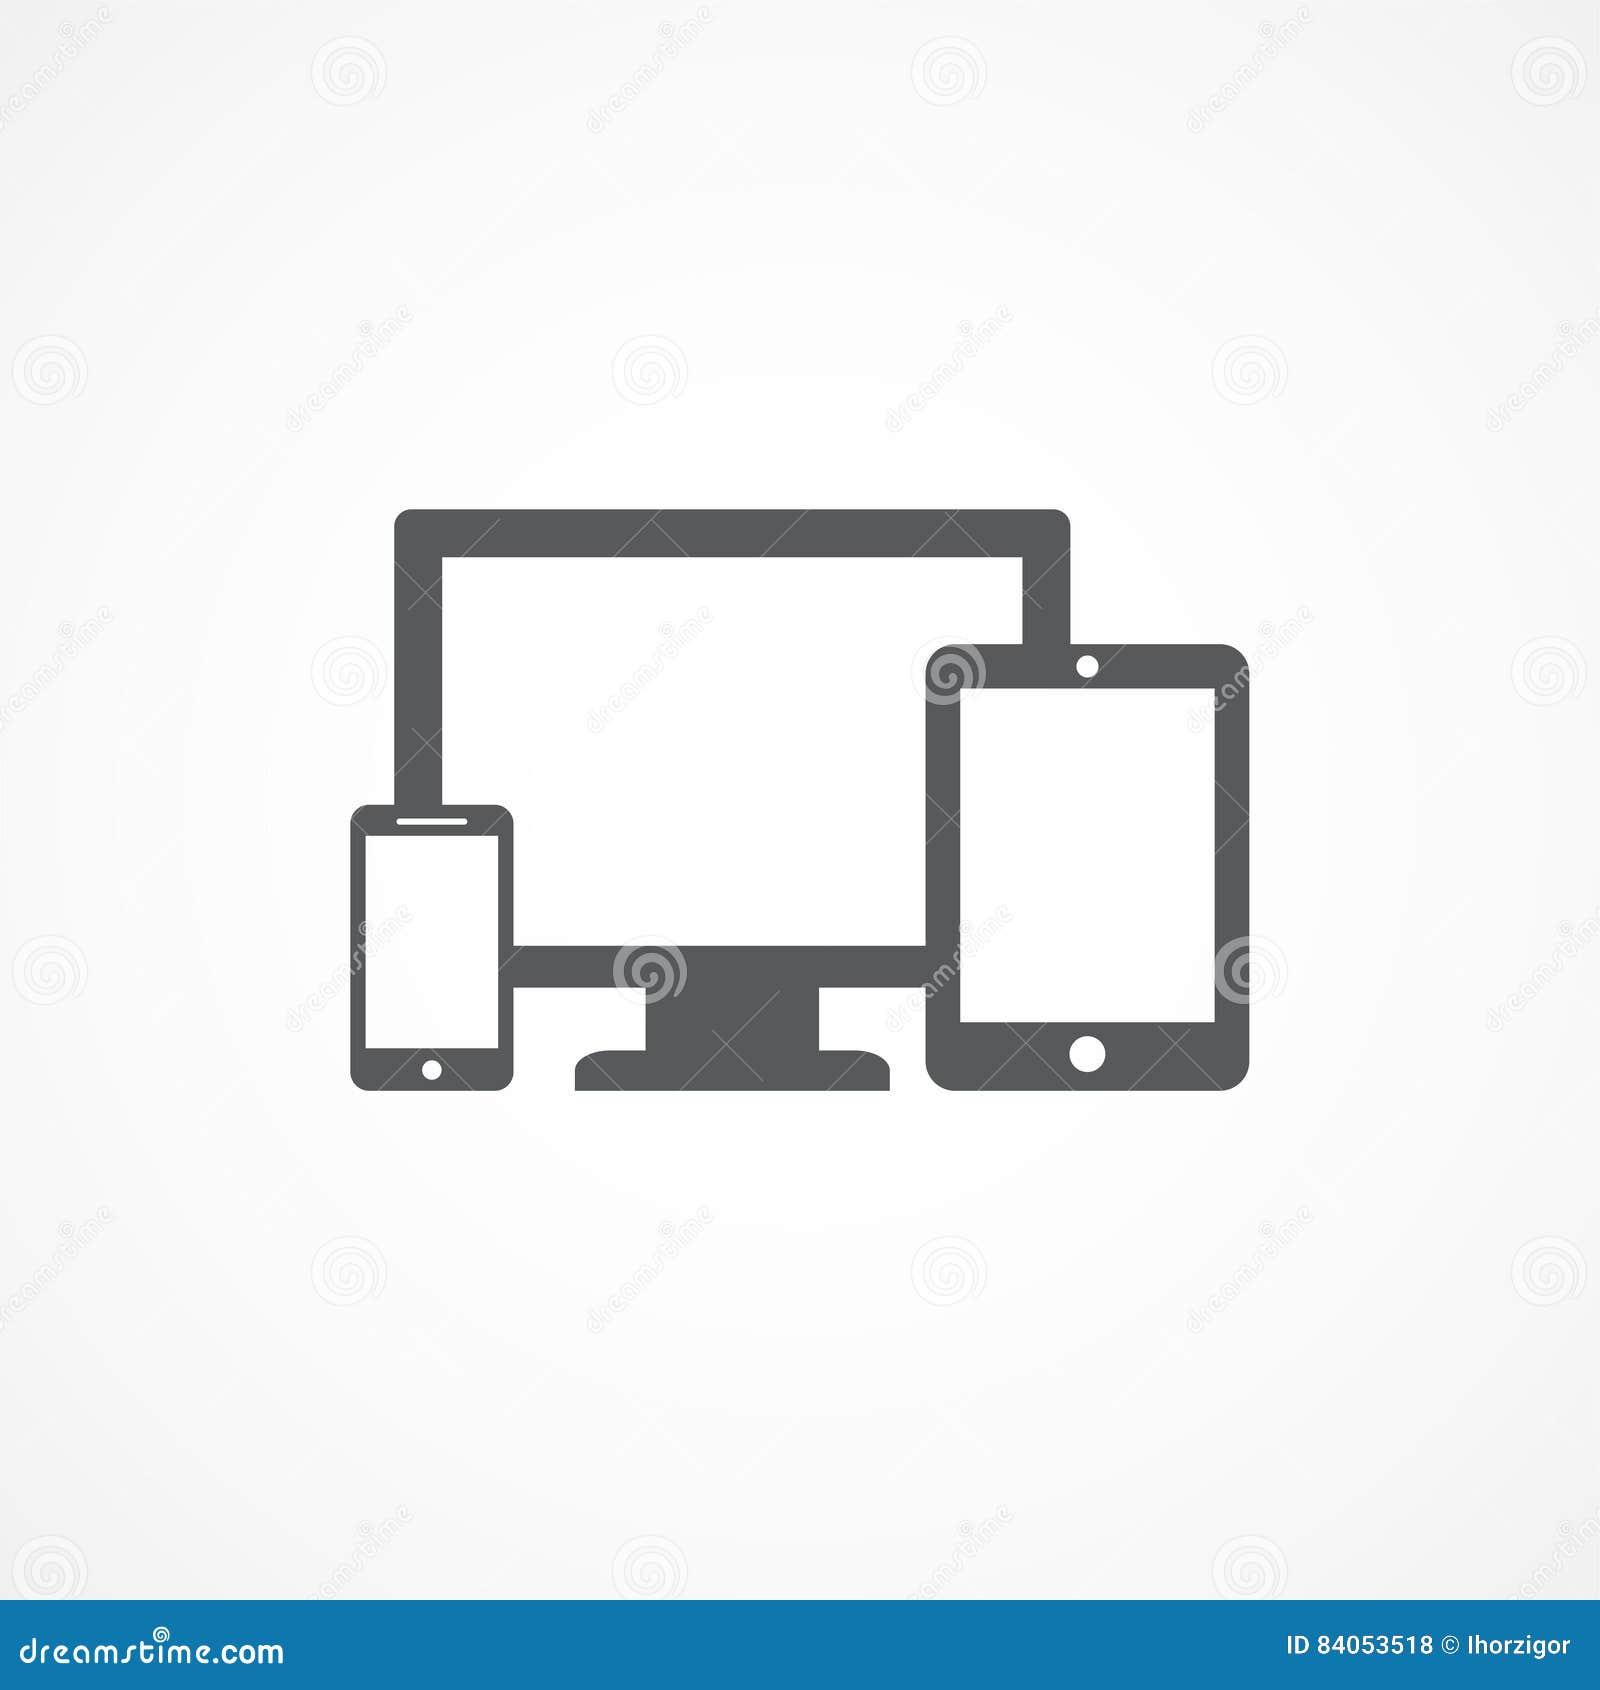 Devices icon